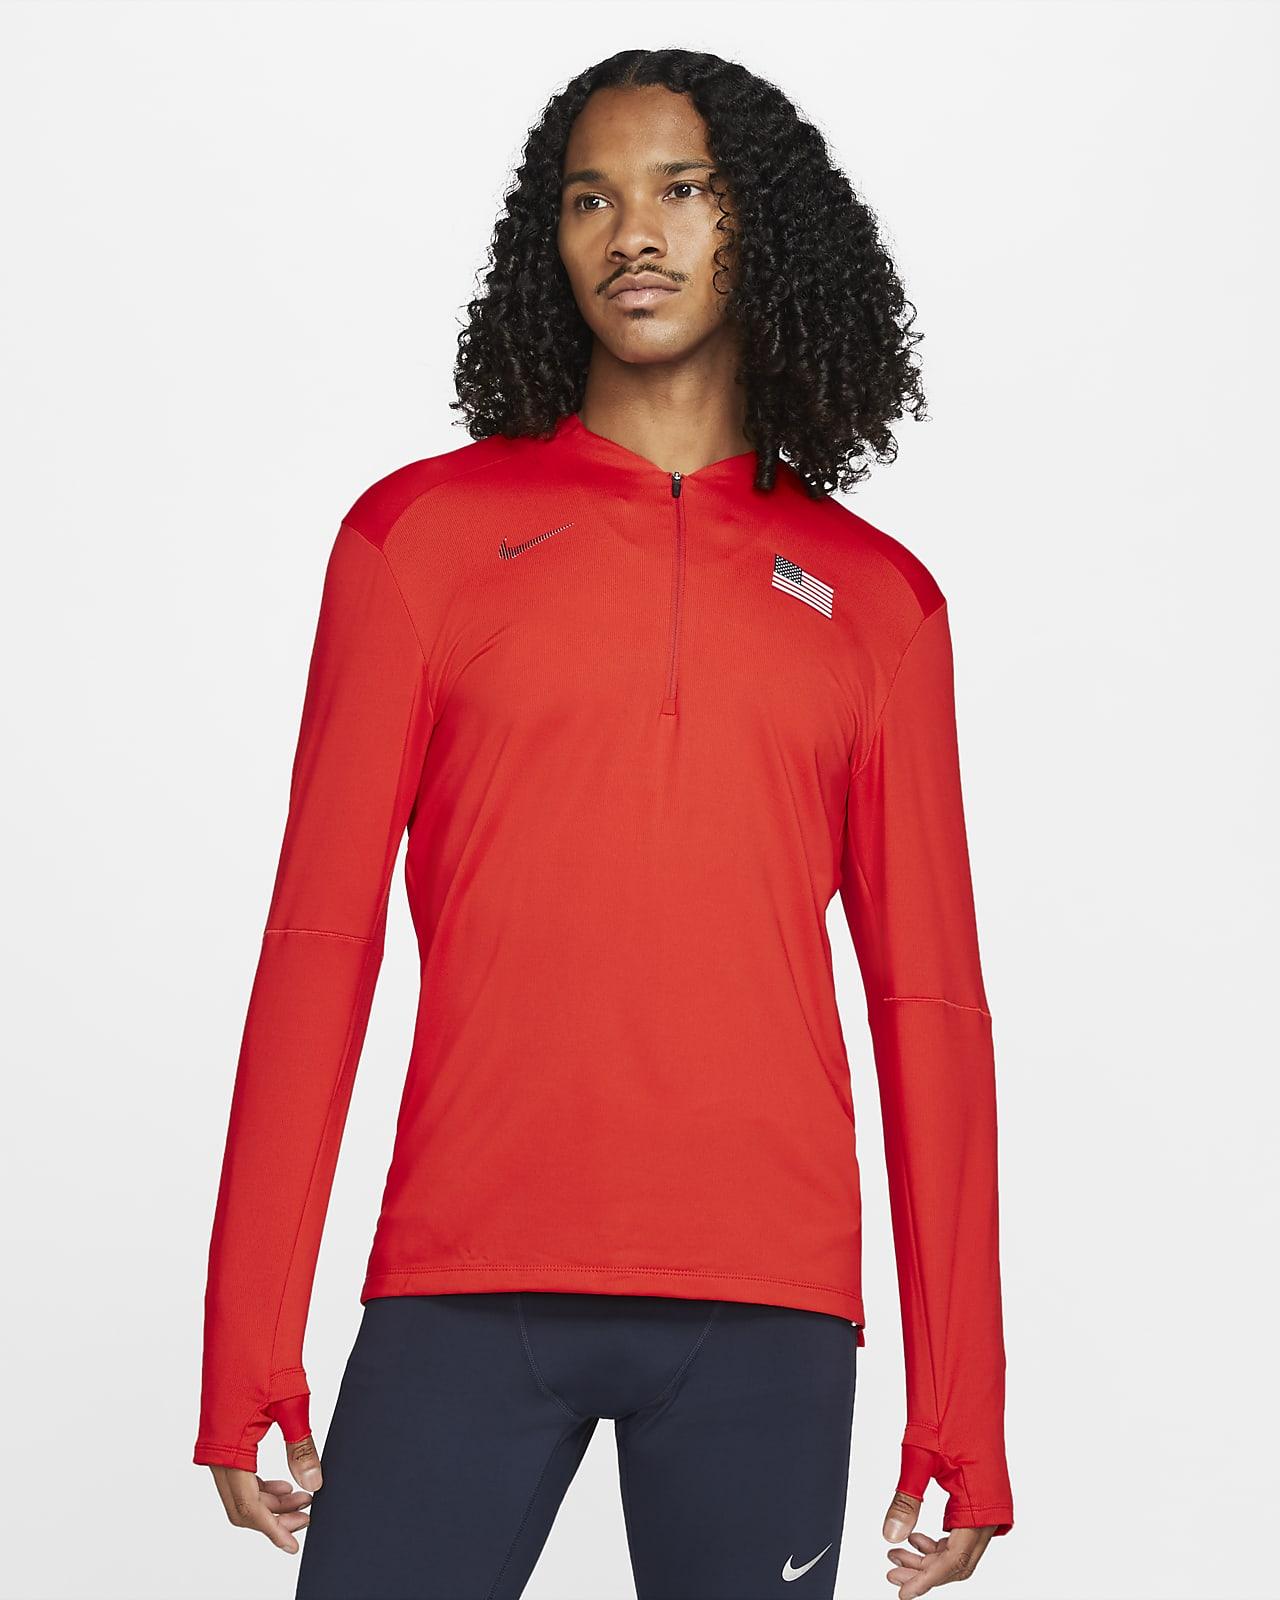 Nike Dri-FIT Team USA Element Men's 1/2-Zip Running Top